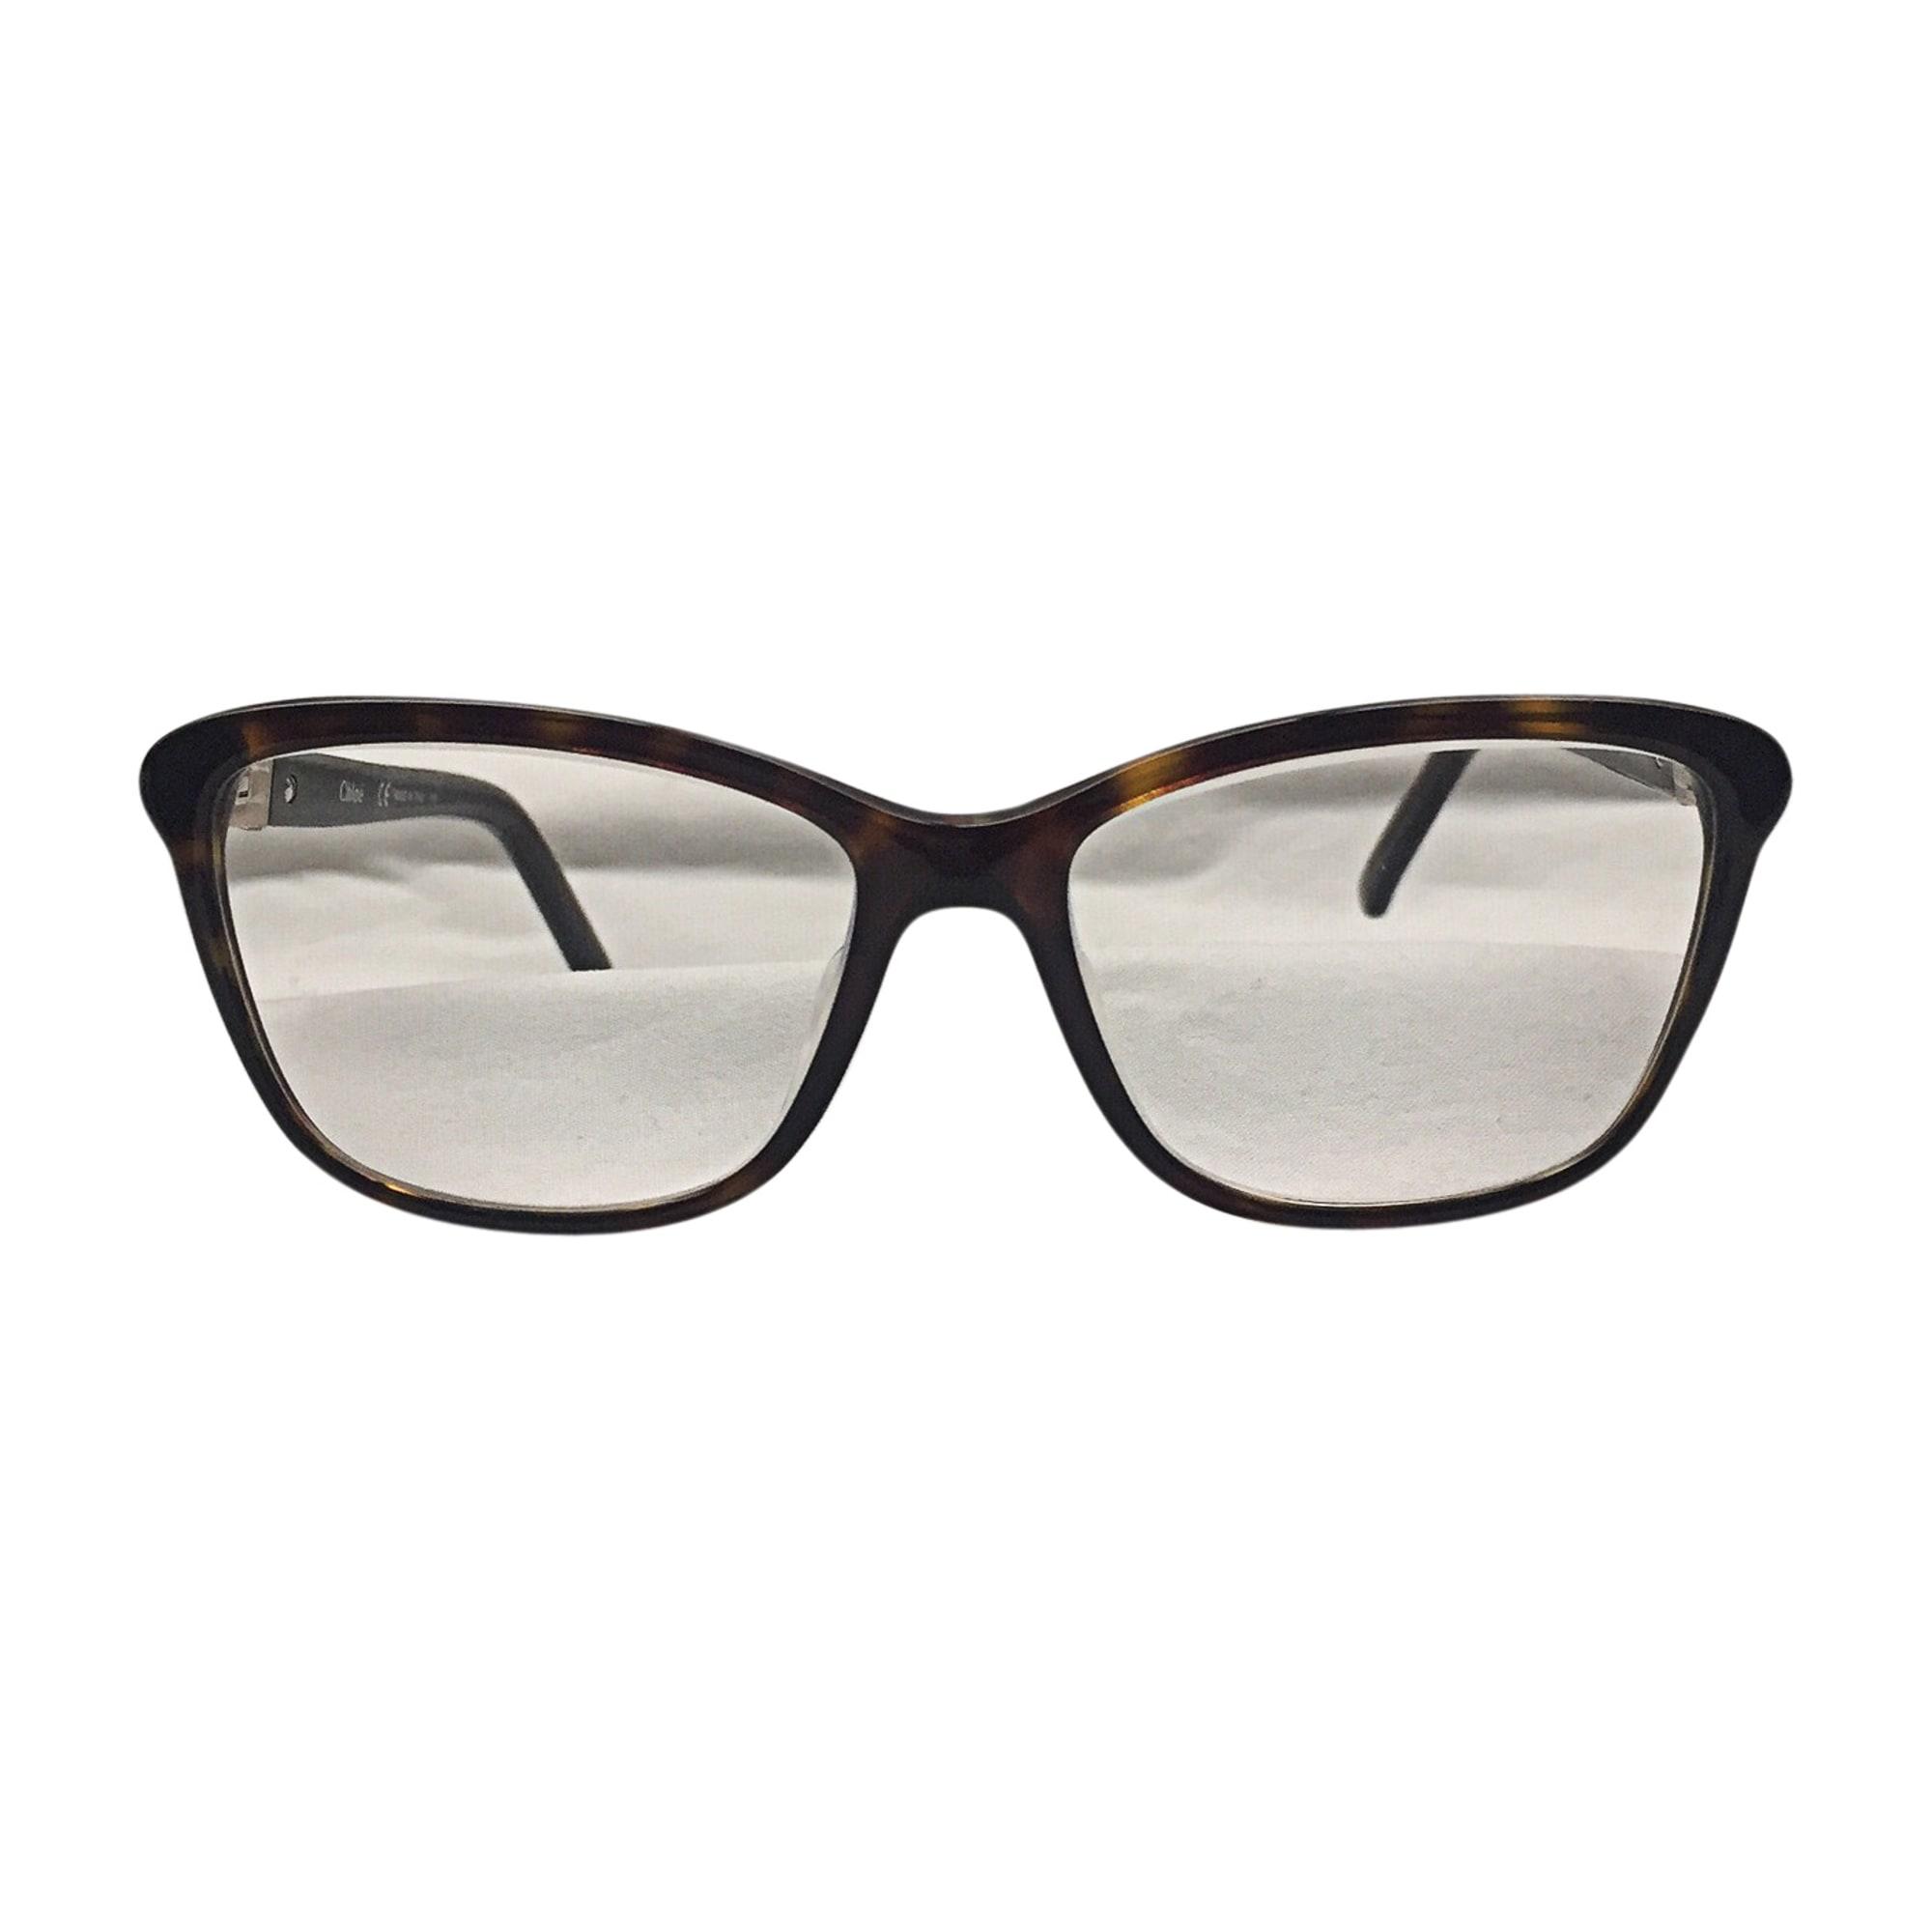 Eyeglass Frames CHLOÉ Brown